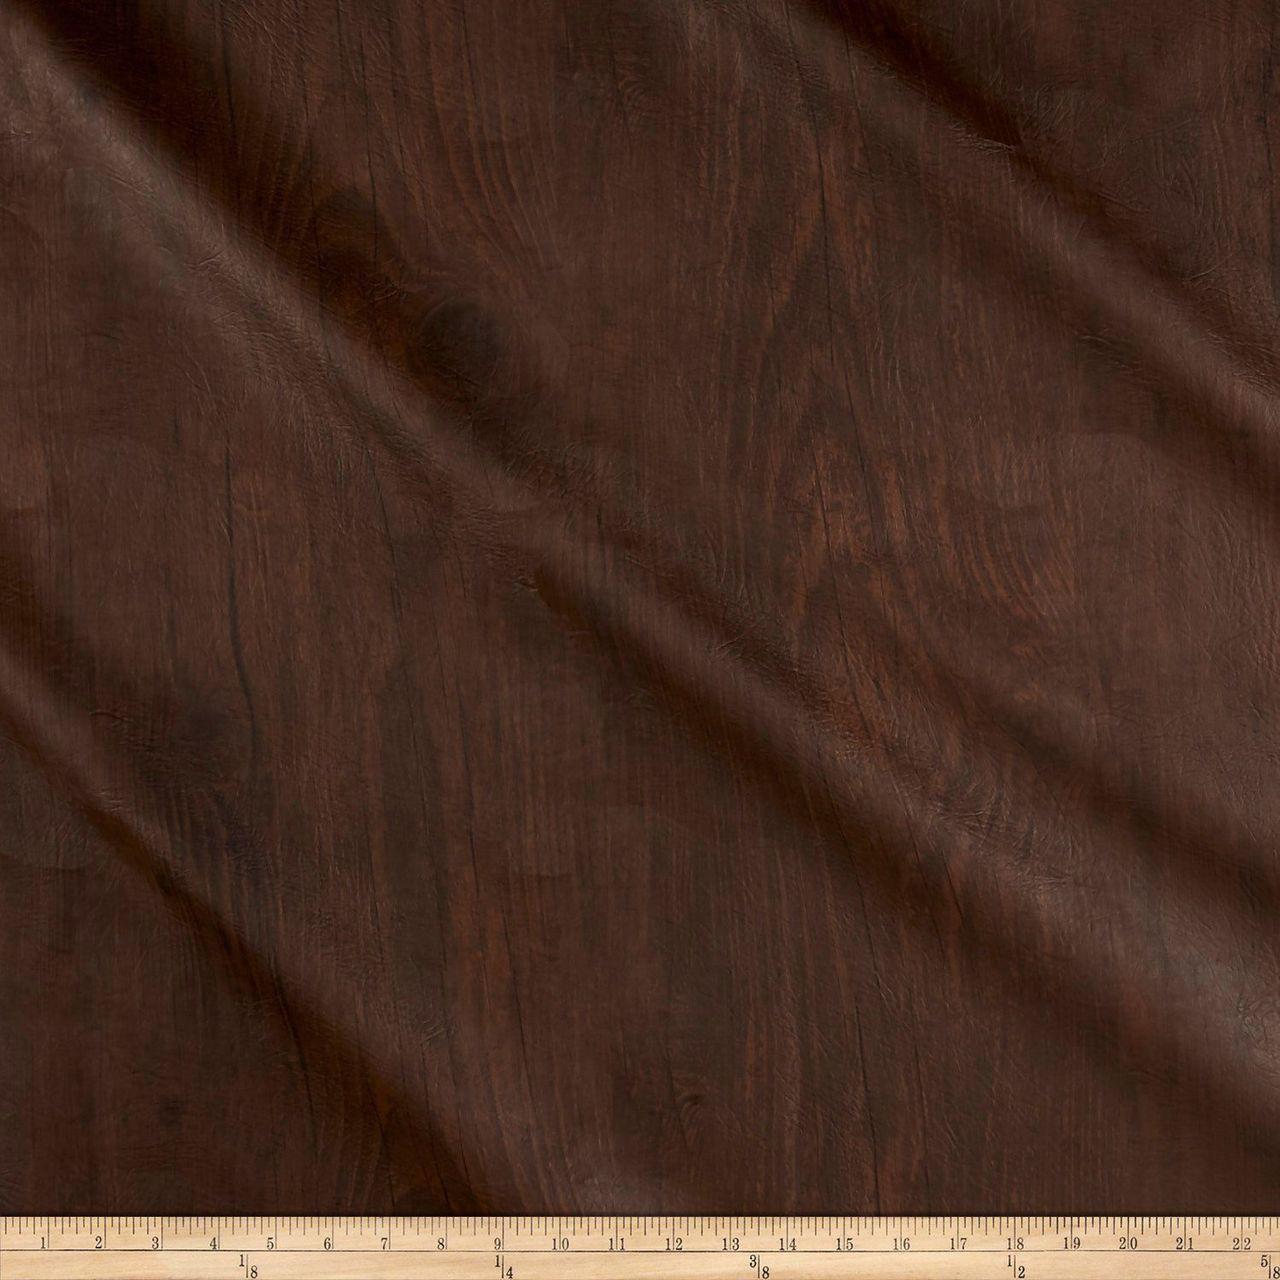 Richloom Tough Faux Leather Pleather Vinyl Dellwood Walnut